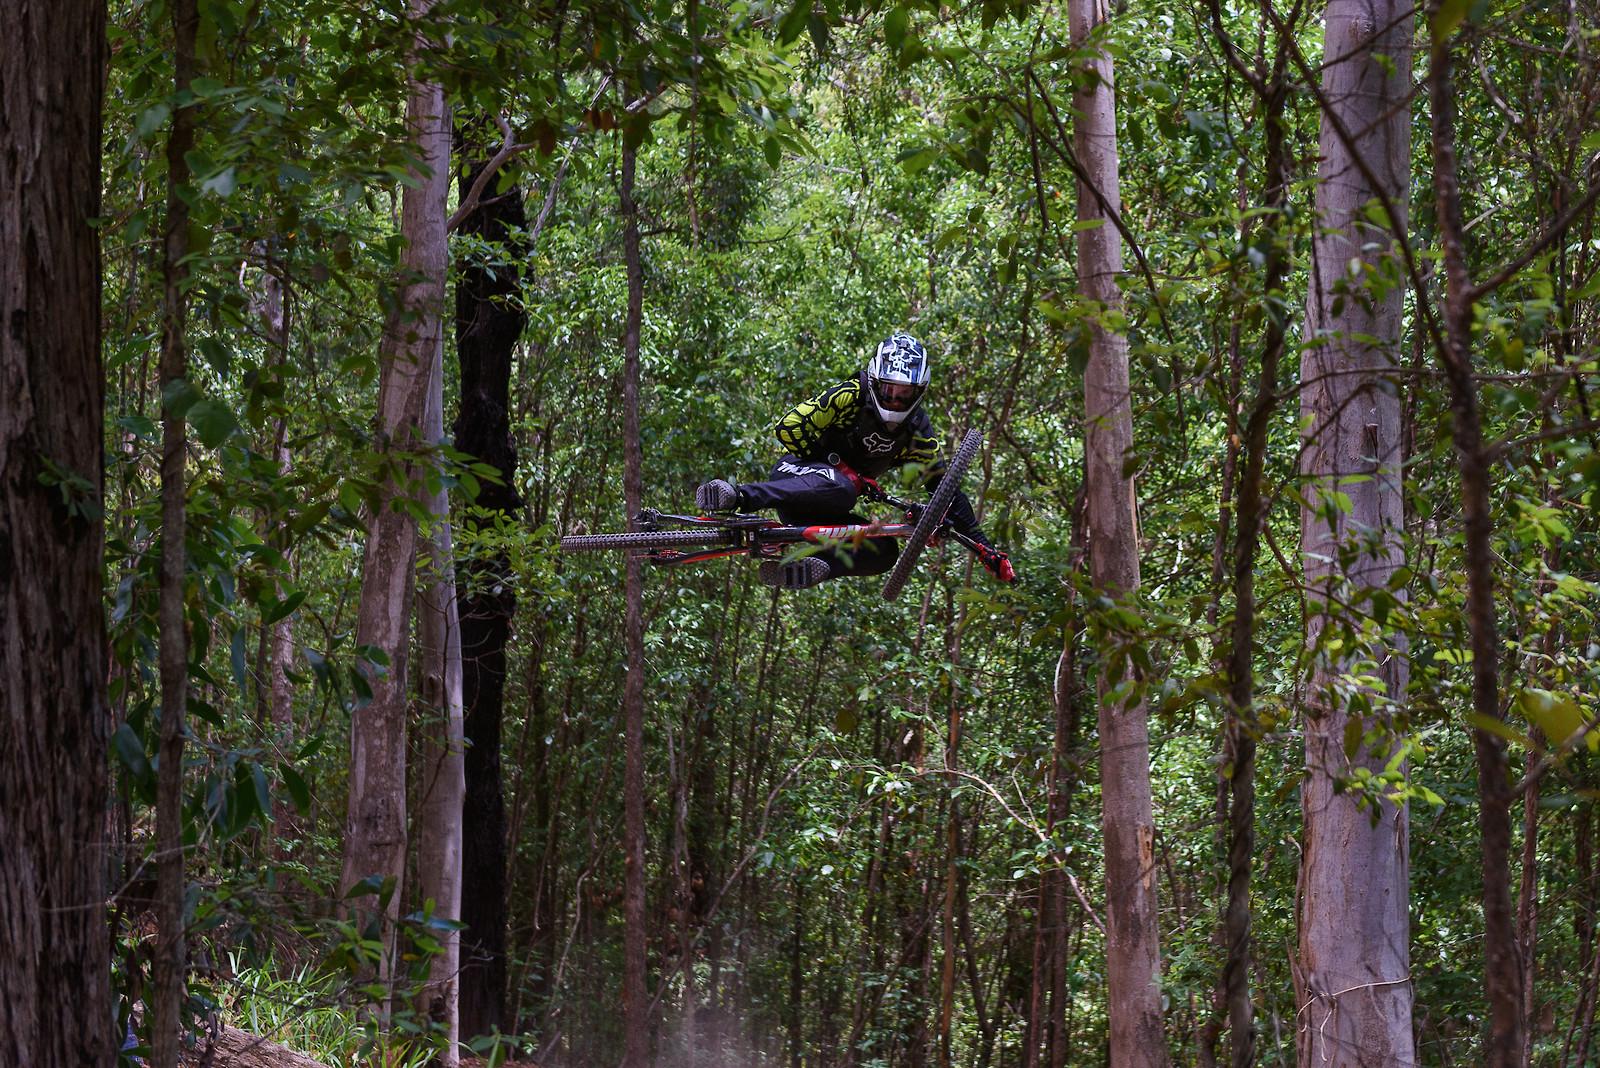 this hip is fun - Zer0mtb - Mountain Biking Pictures - Vital MTB